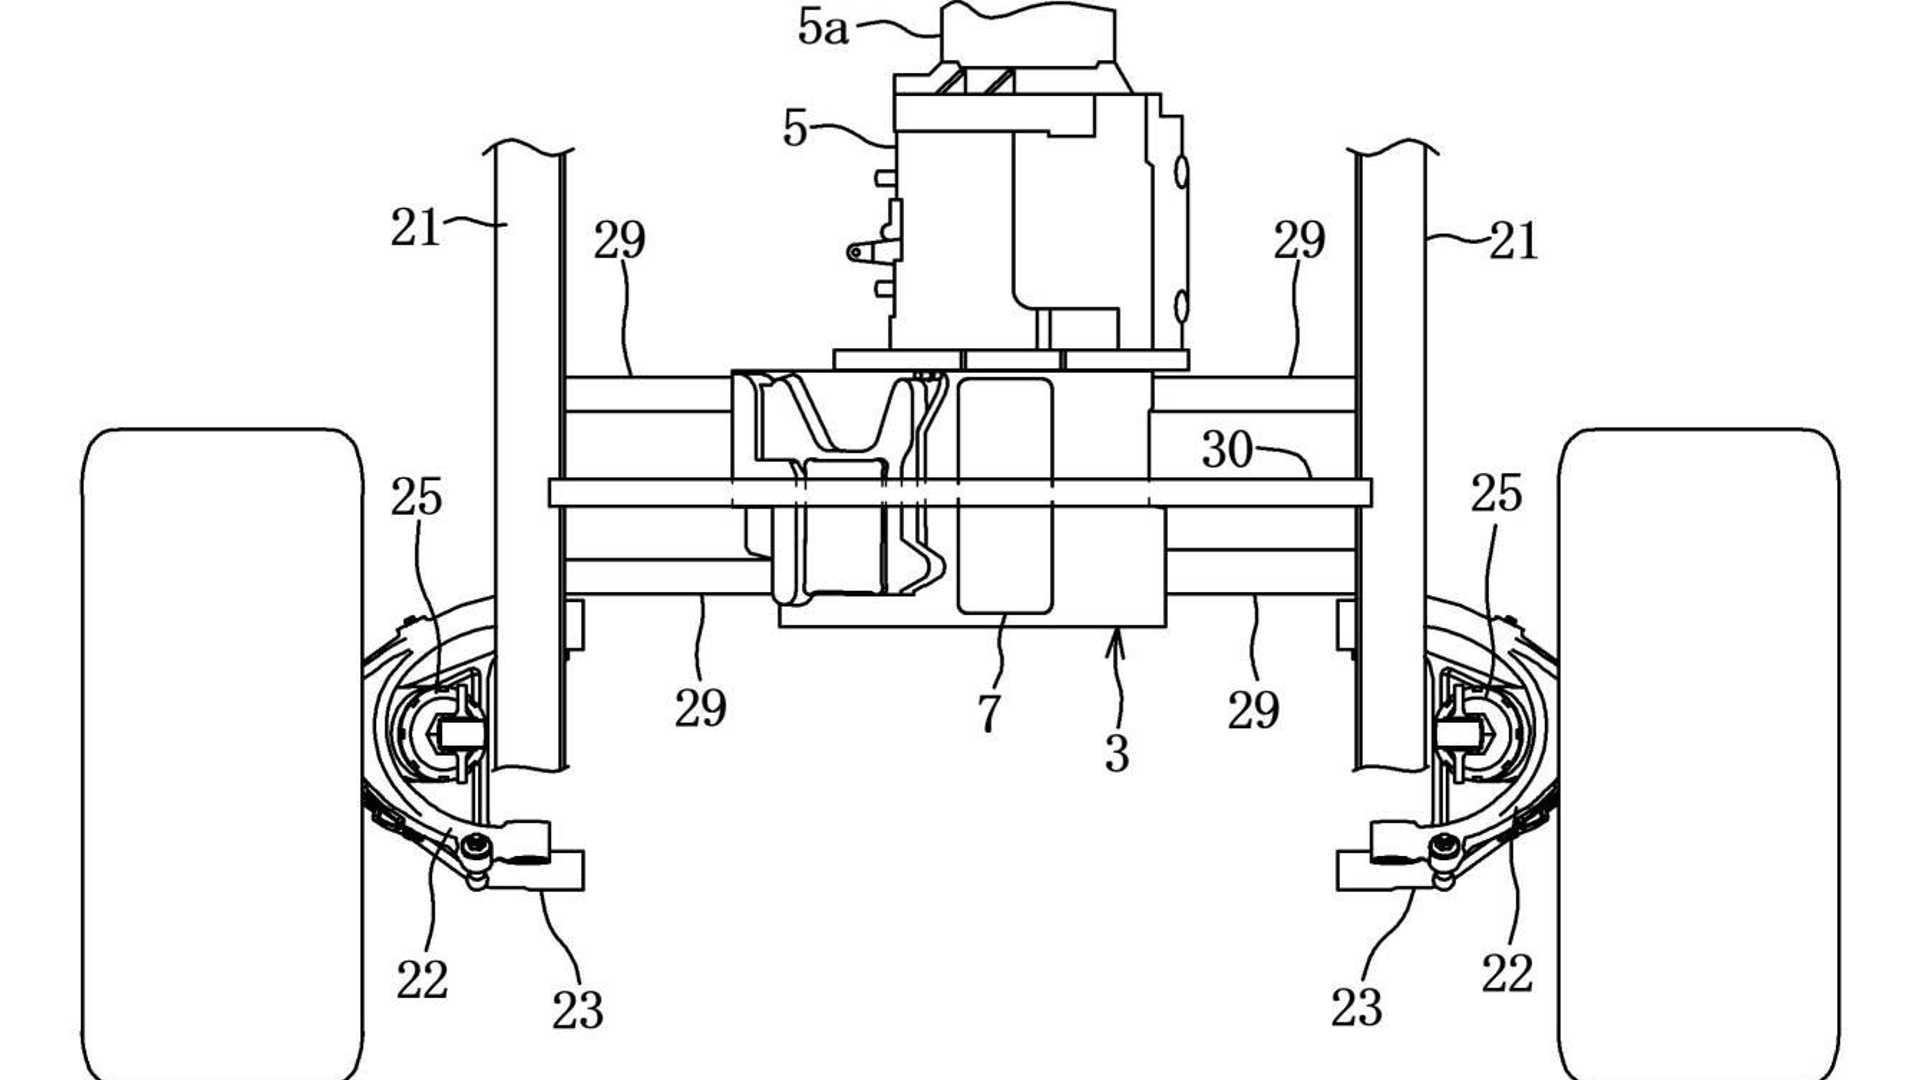 Mazda-Rotary-Engine-Hybrid-Patent-4